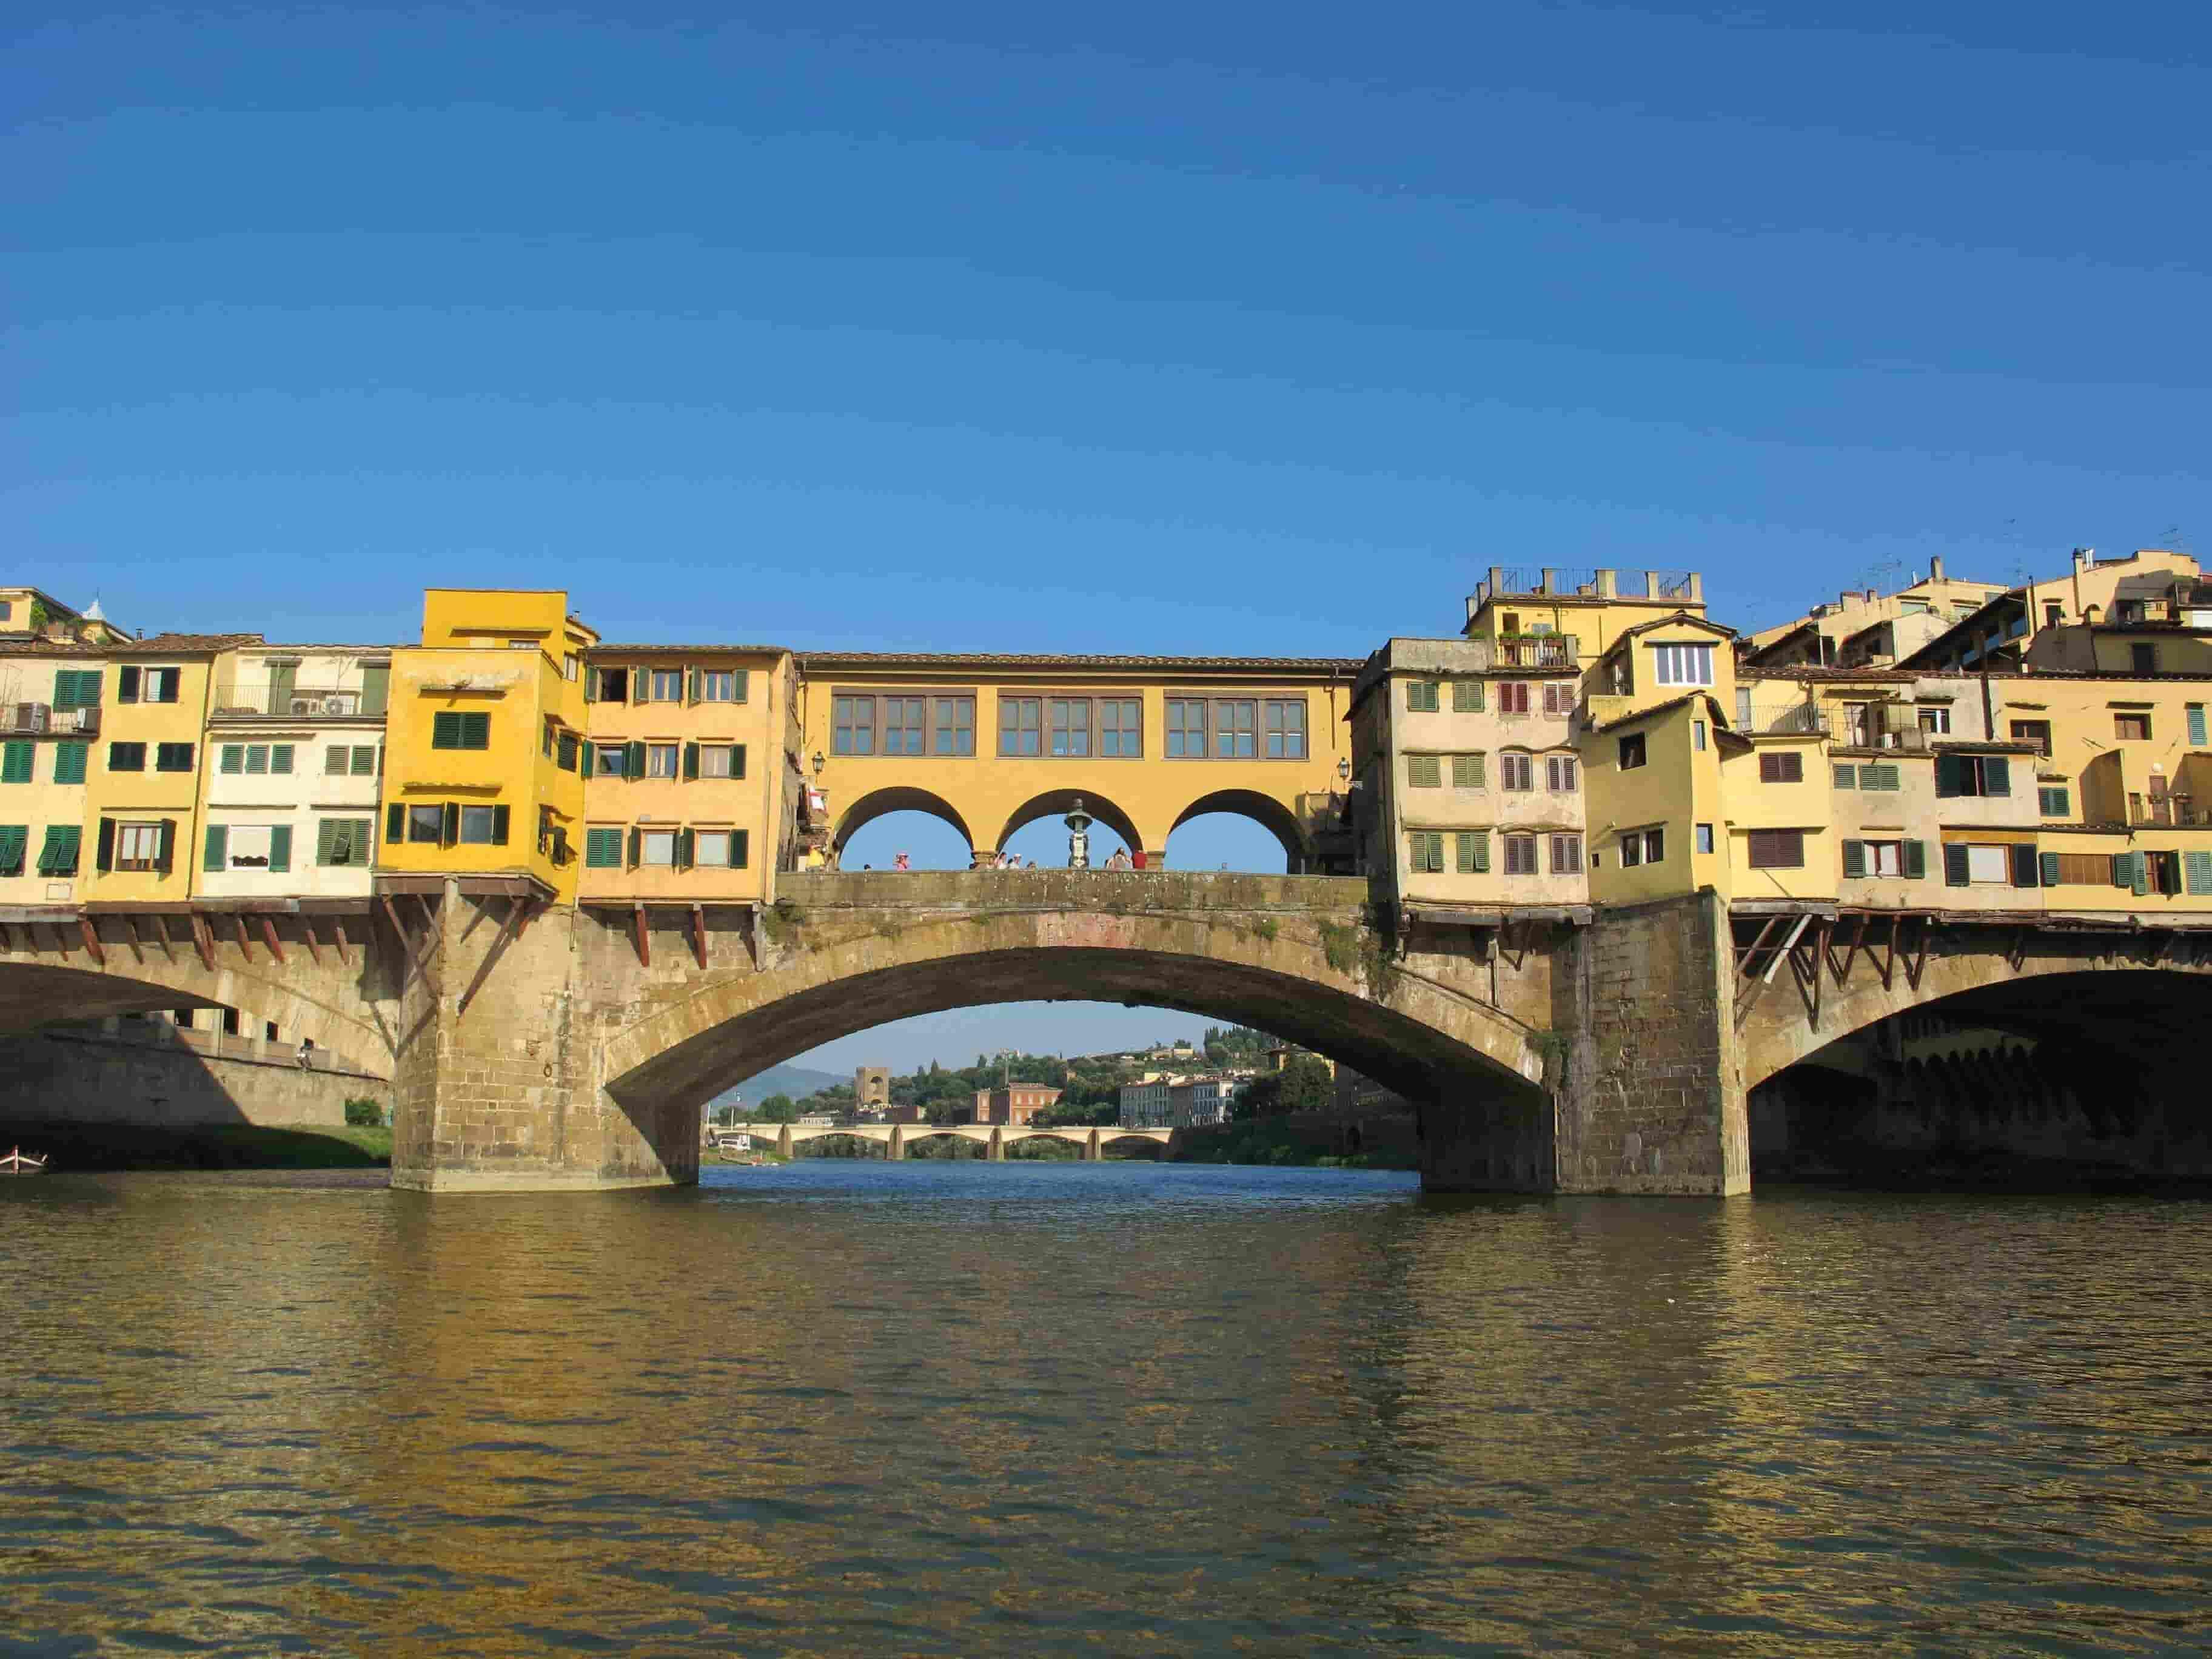 Ponte Vecchio, Italy